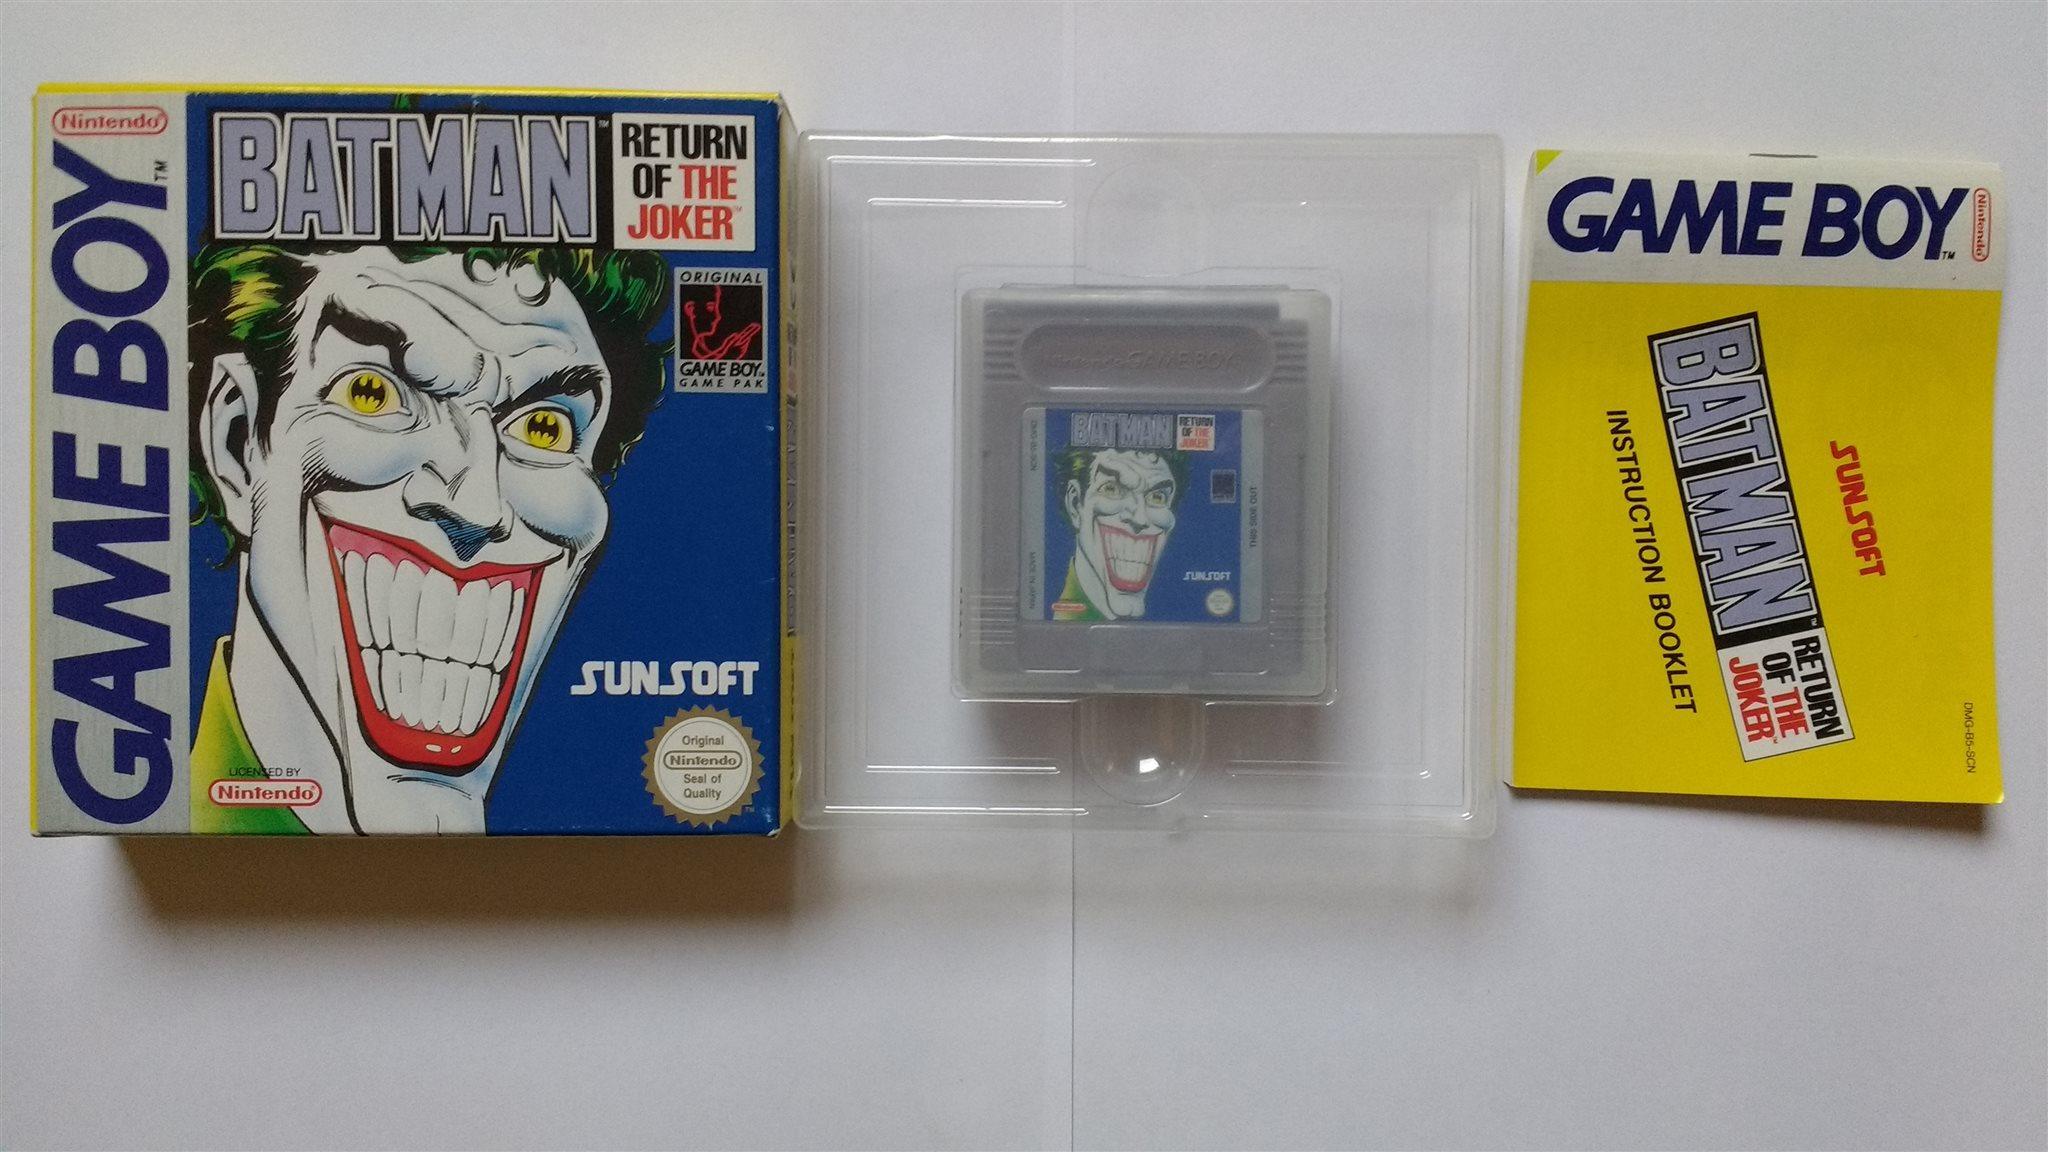 1kr Gameboy Batman Return Of The Joker Samlars 336192963 ᐈ Kop